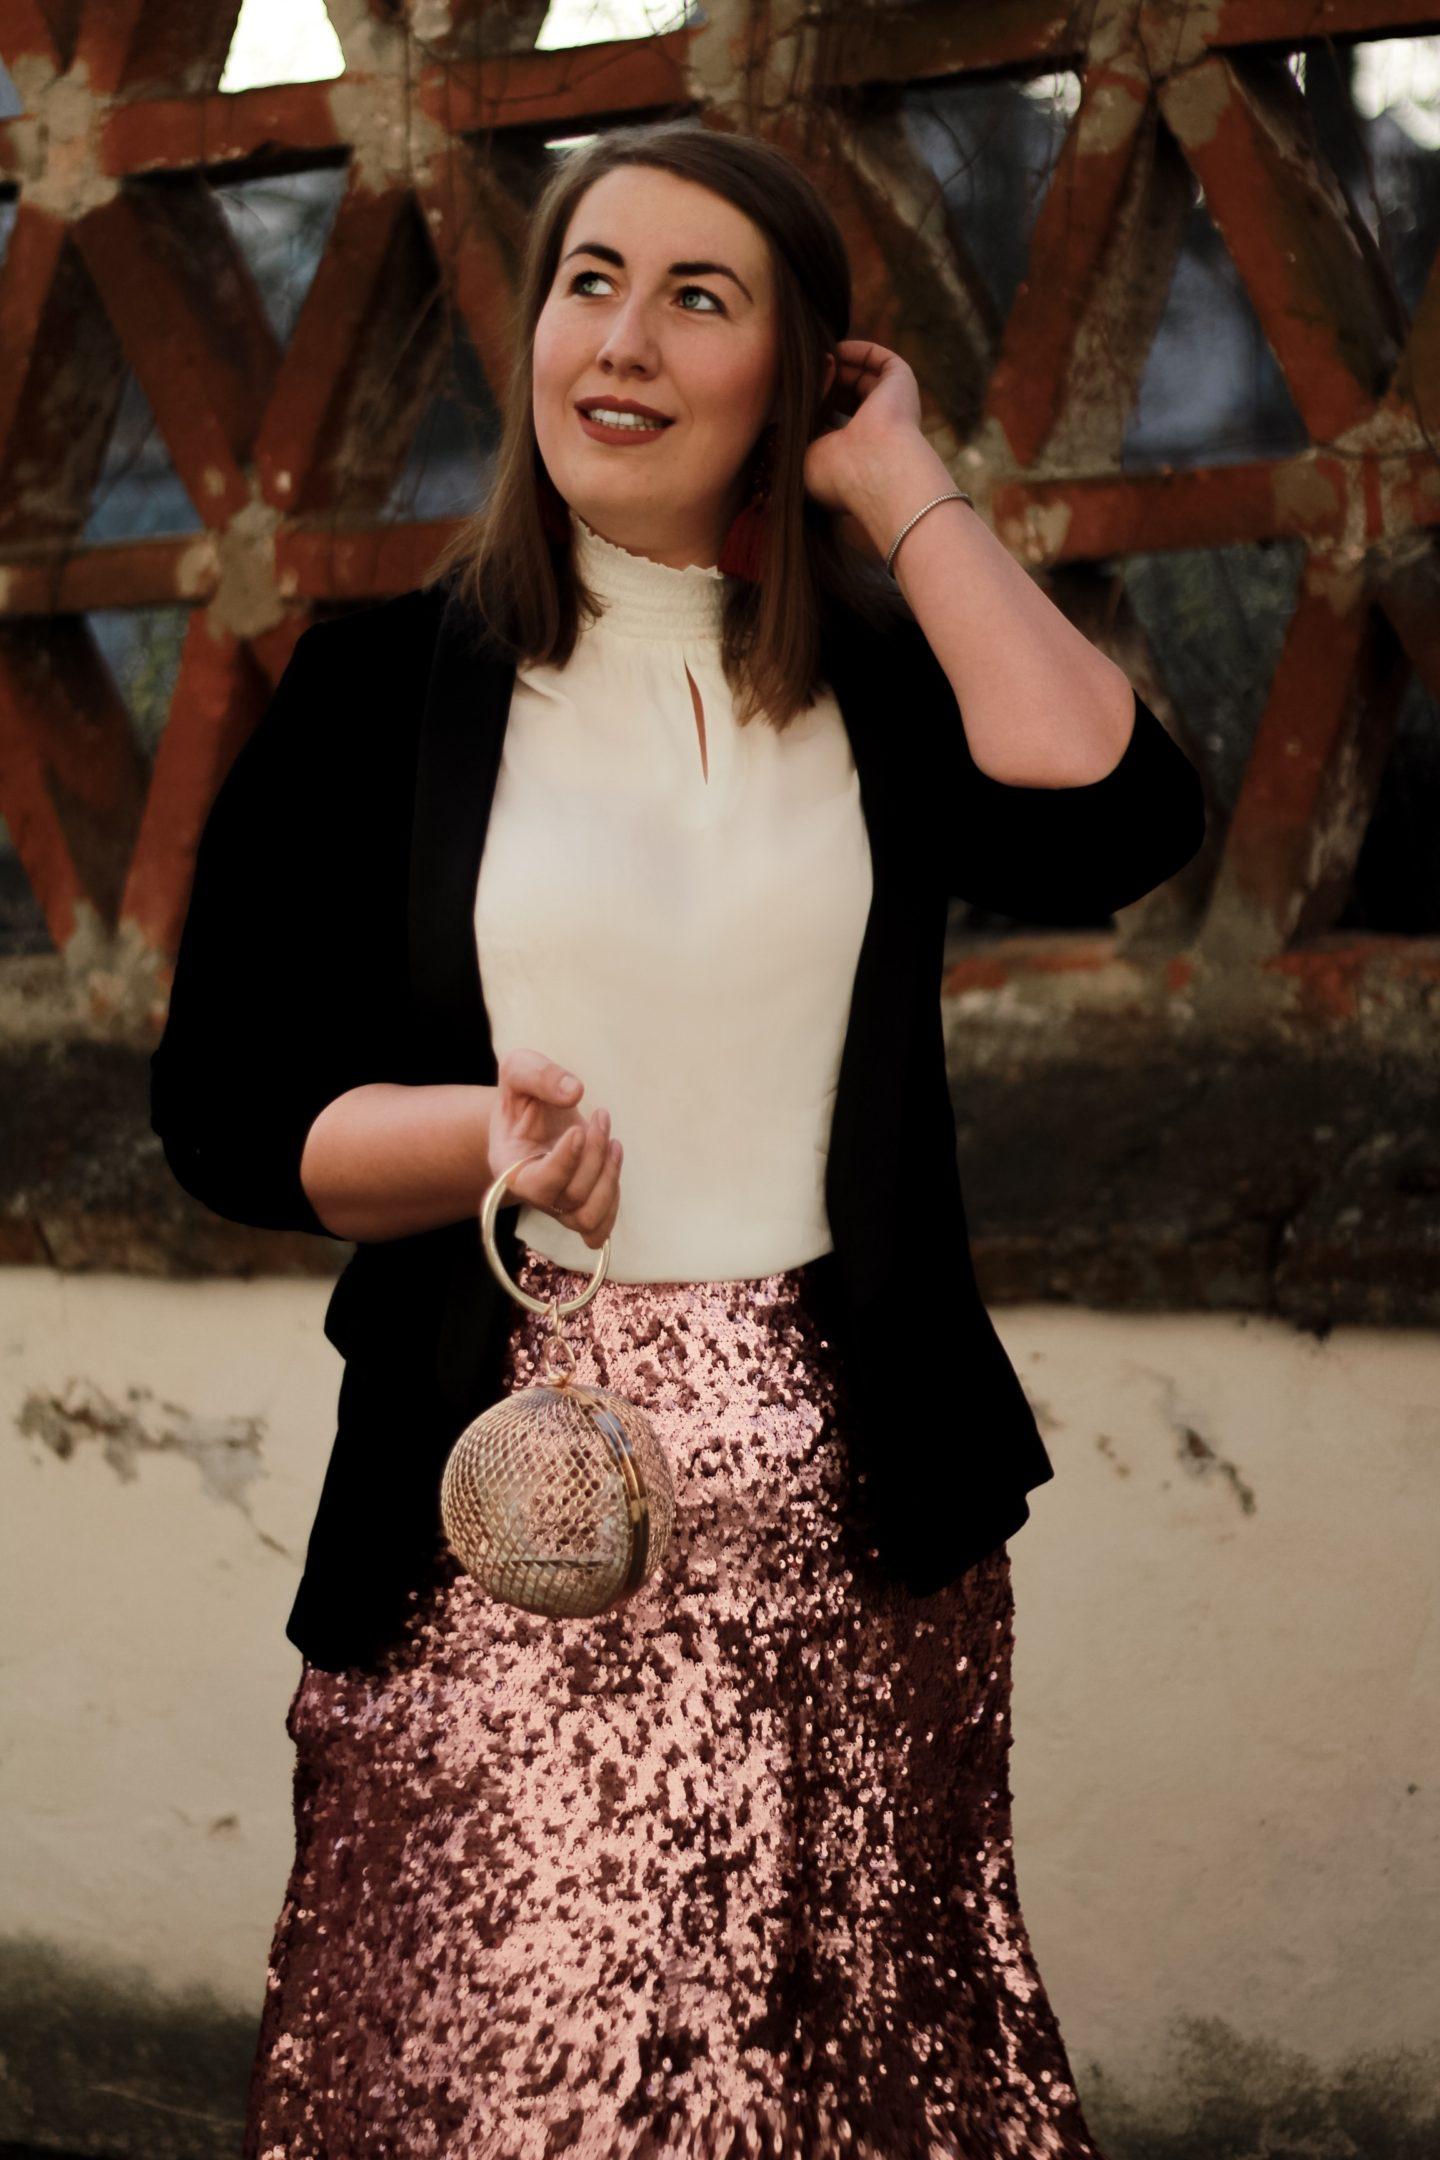 Miss-Suzie-Loves-Susanne-Heidebach-Silvester-Outfit-Pailletten-Rock-Samt-Blazer-Kaefig-Clutch-Fashionblogger-Curvyblogger